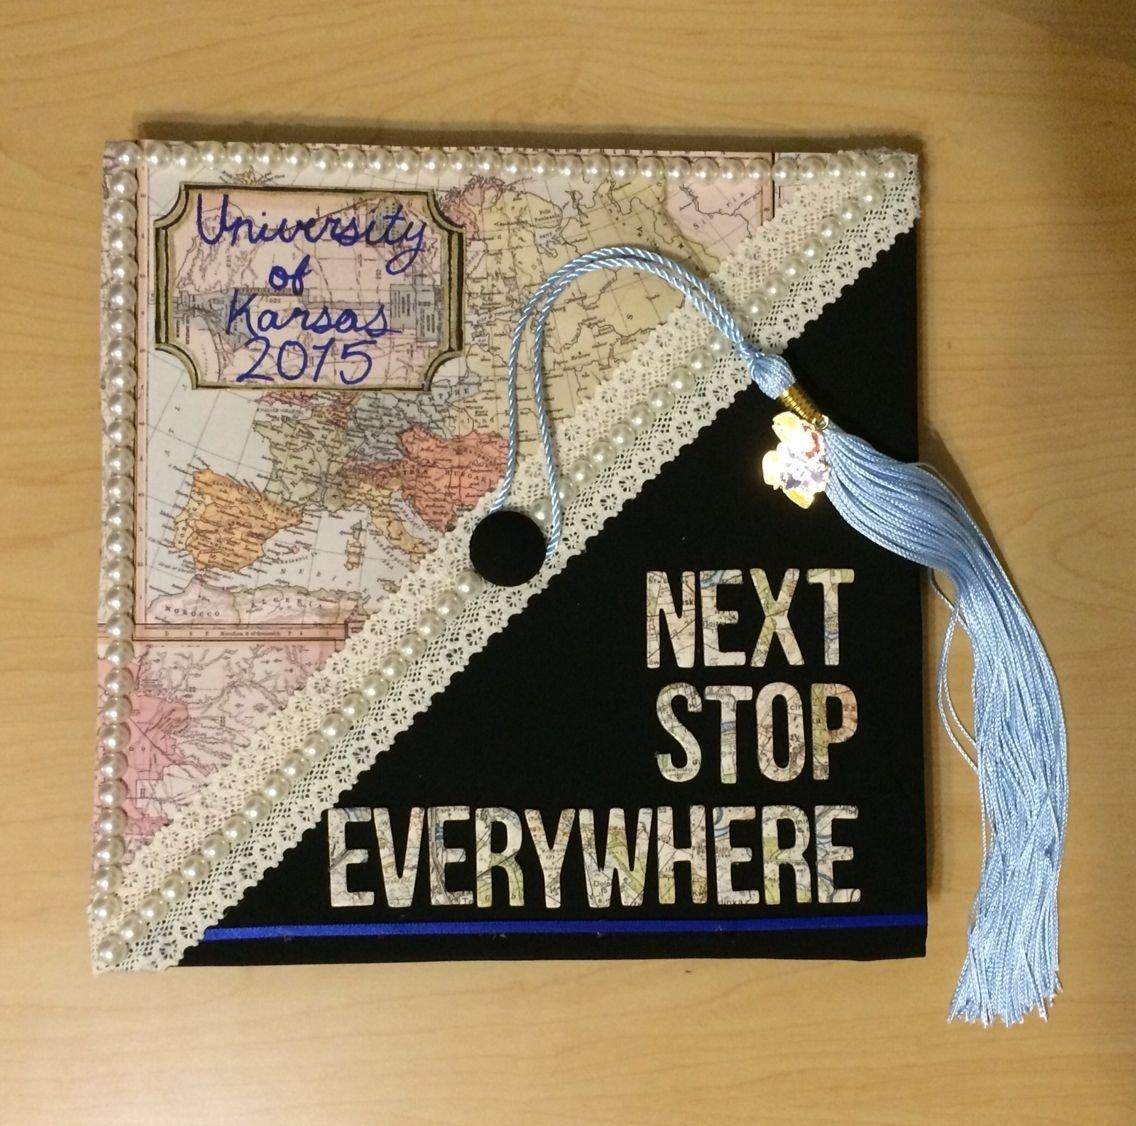 10 Most Recommended College Graduation Cap Decoration Ideas pine black on graduation caps pinterest cap grad cap and